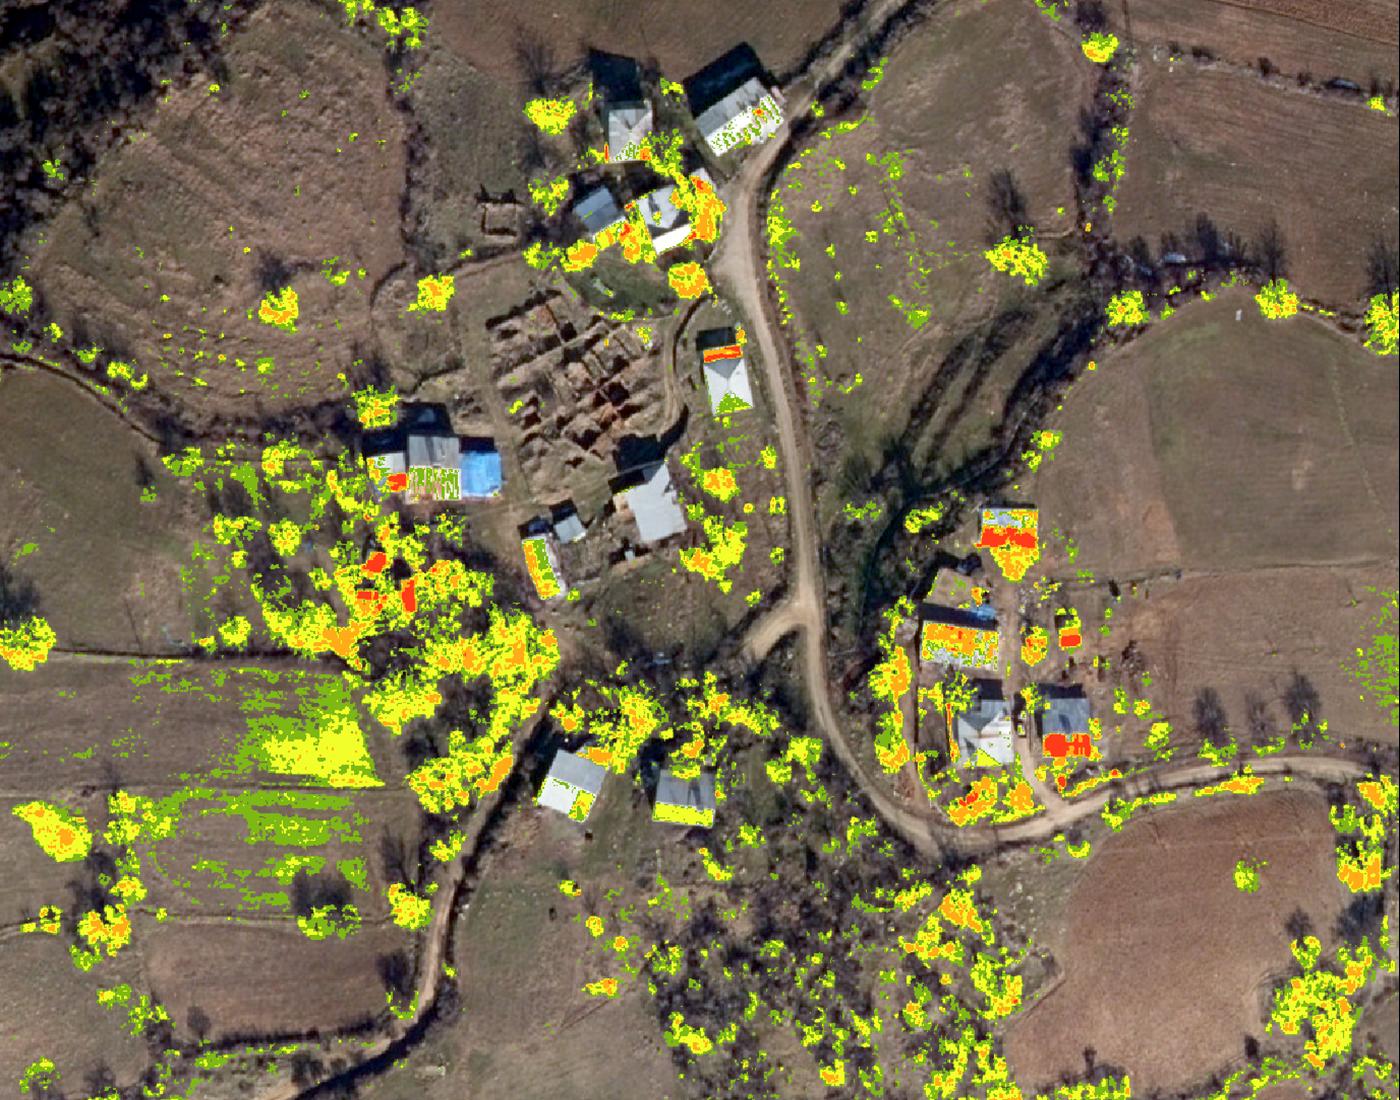 Earth Observation Via Satellites and UAV Imagery